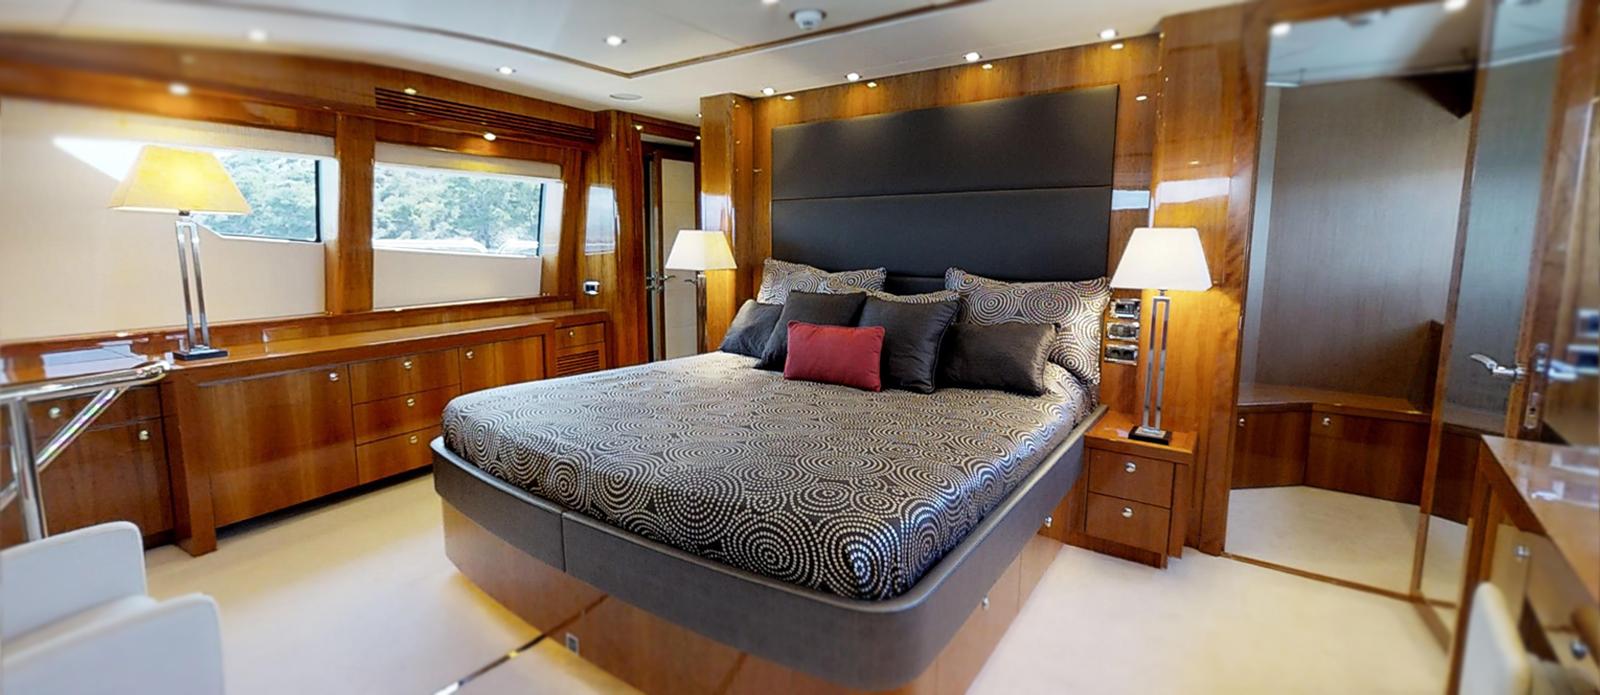 34m Yacht - Sunseeker White Pearl